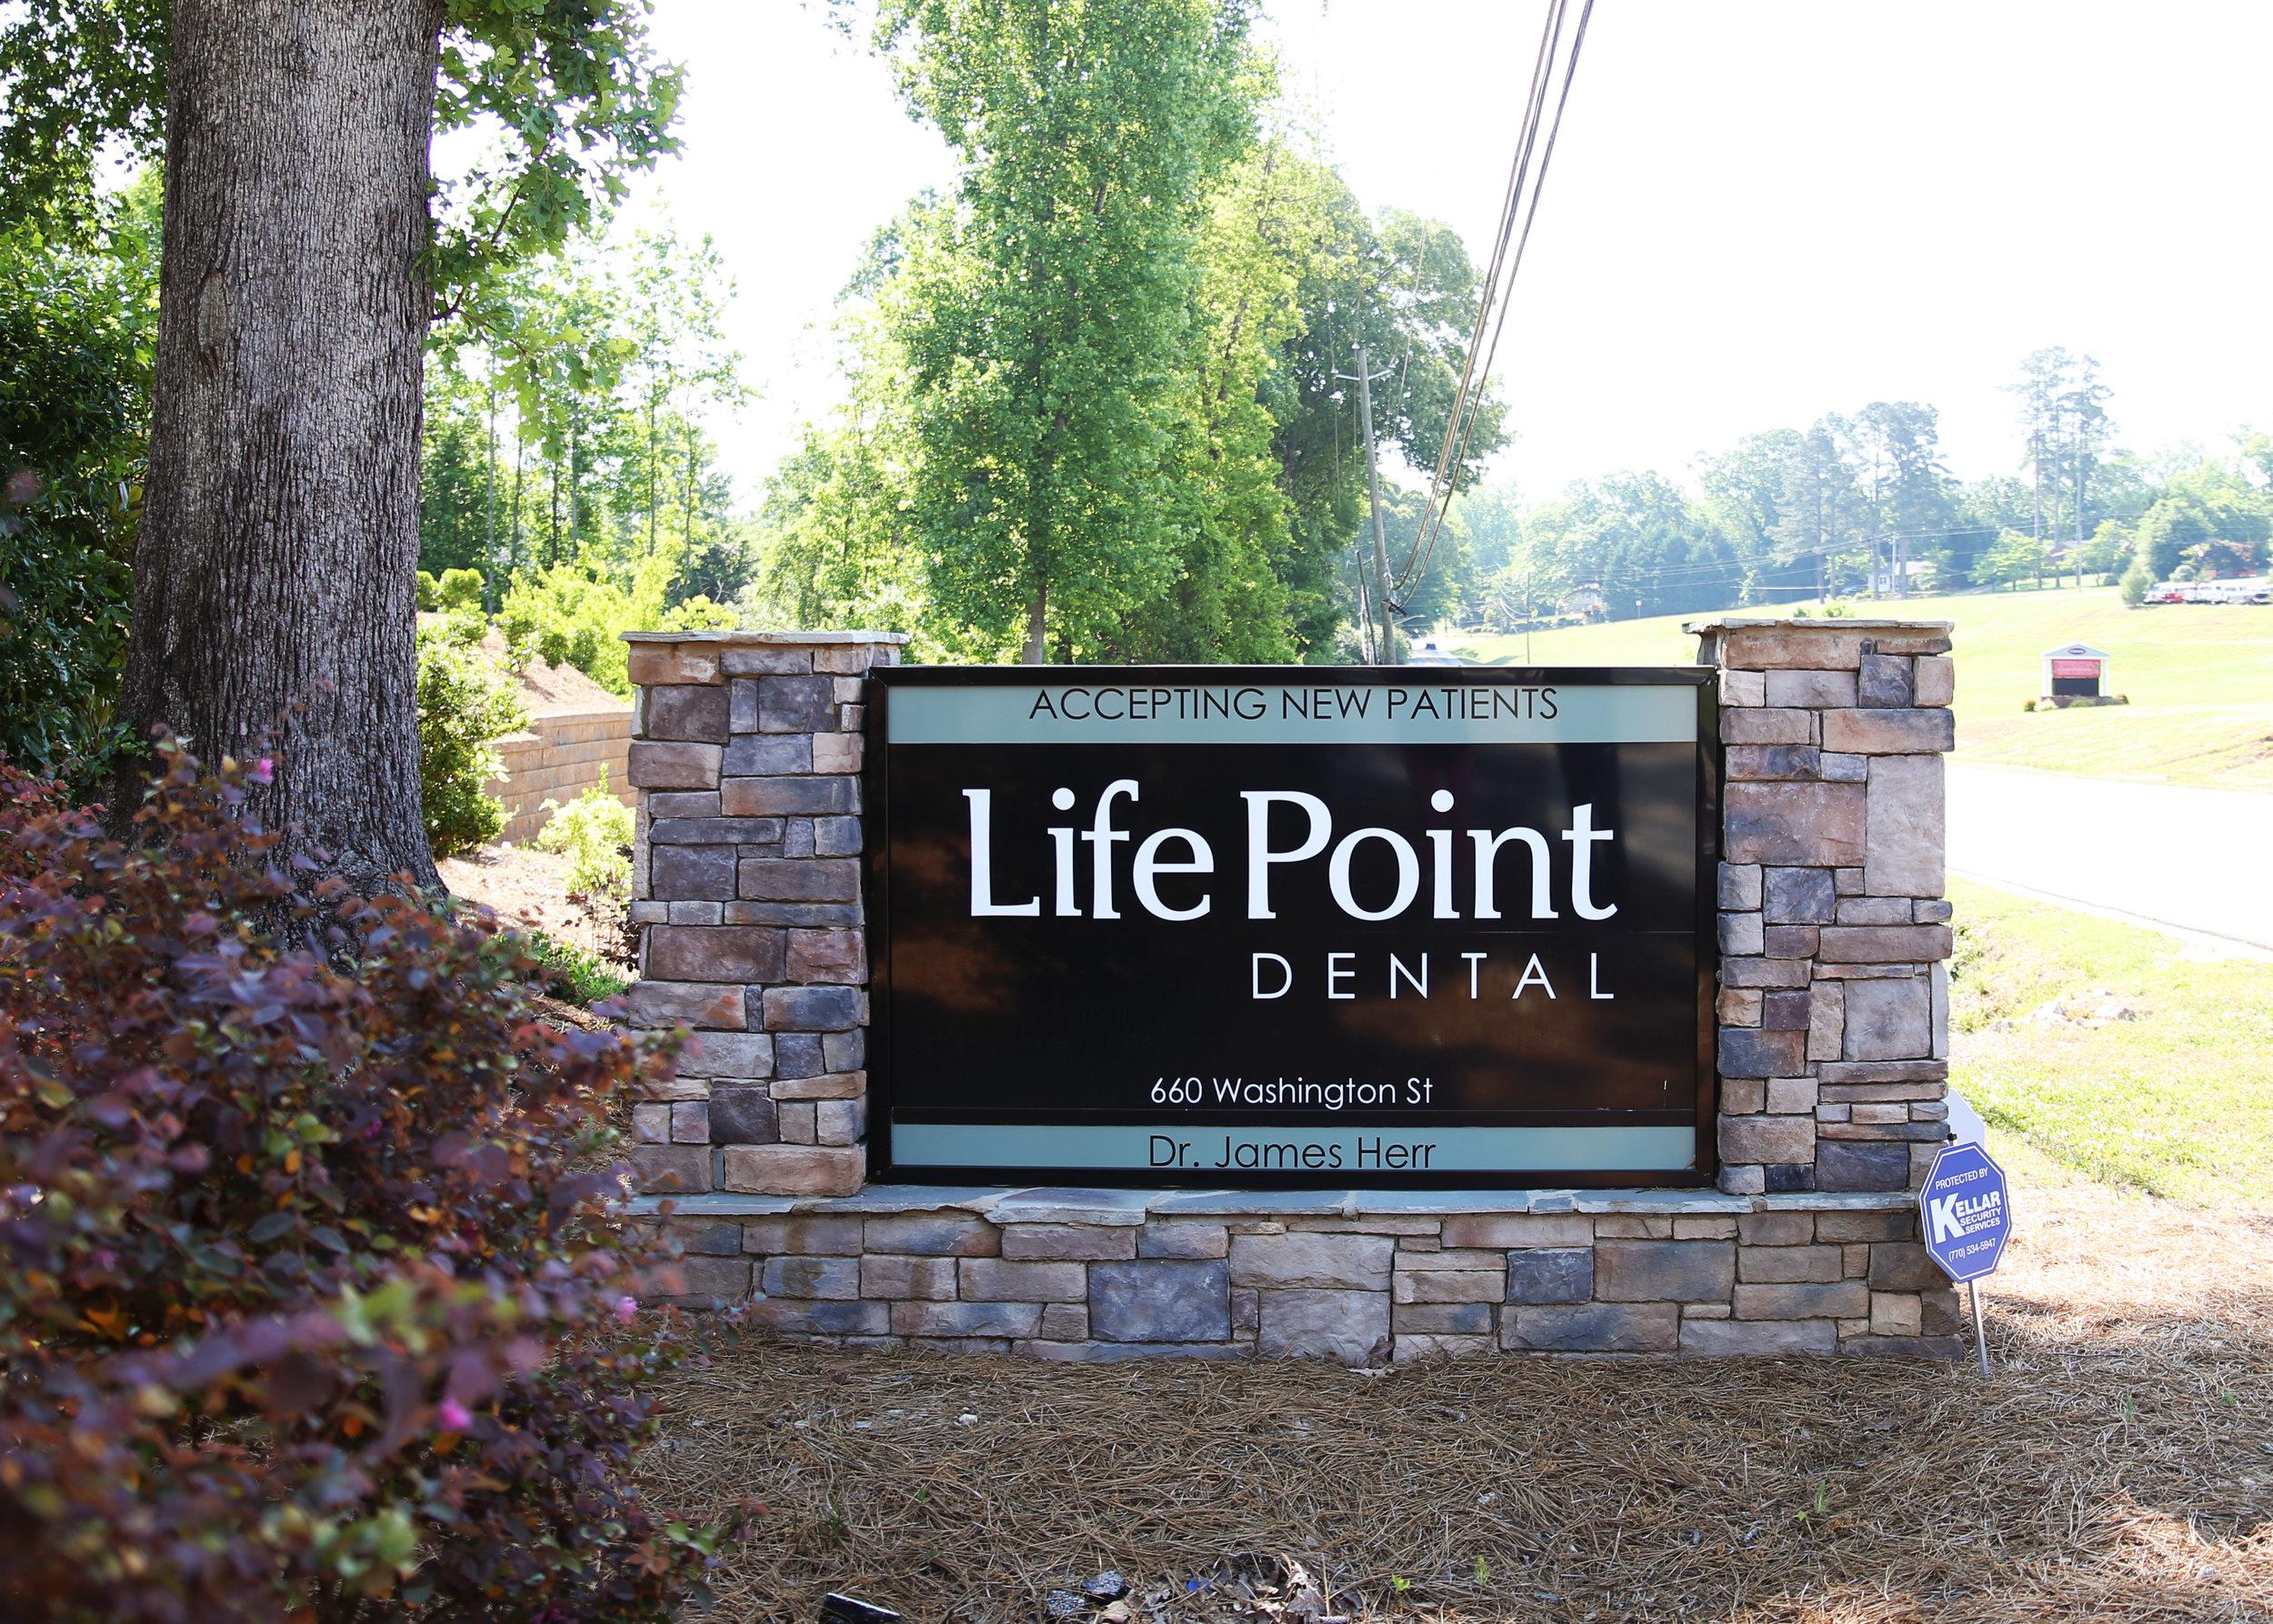 Life Point Dental home to Dr. James Herr- Jefferson, GA